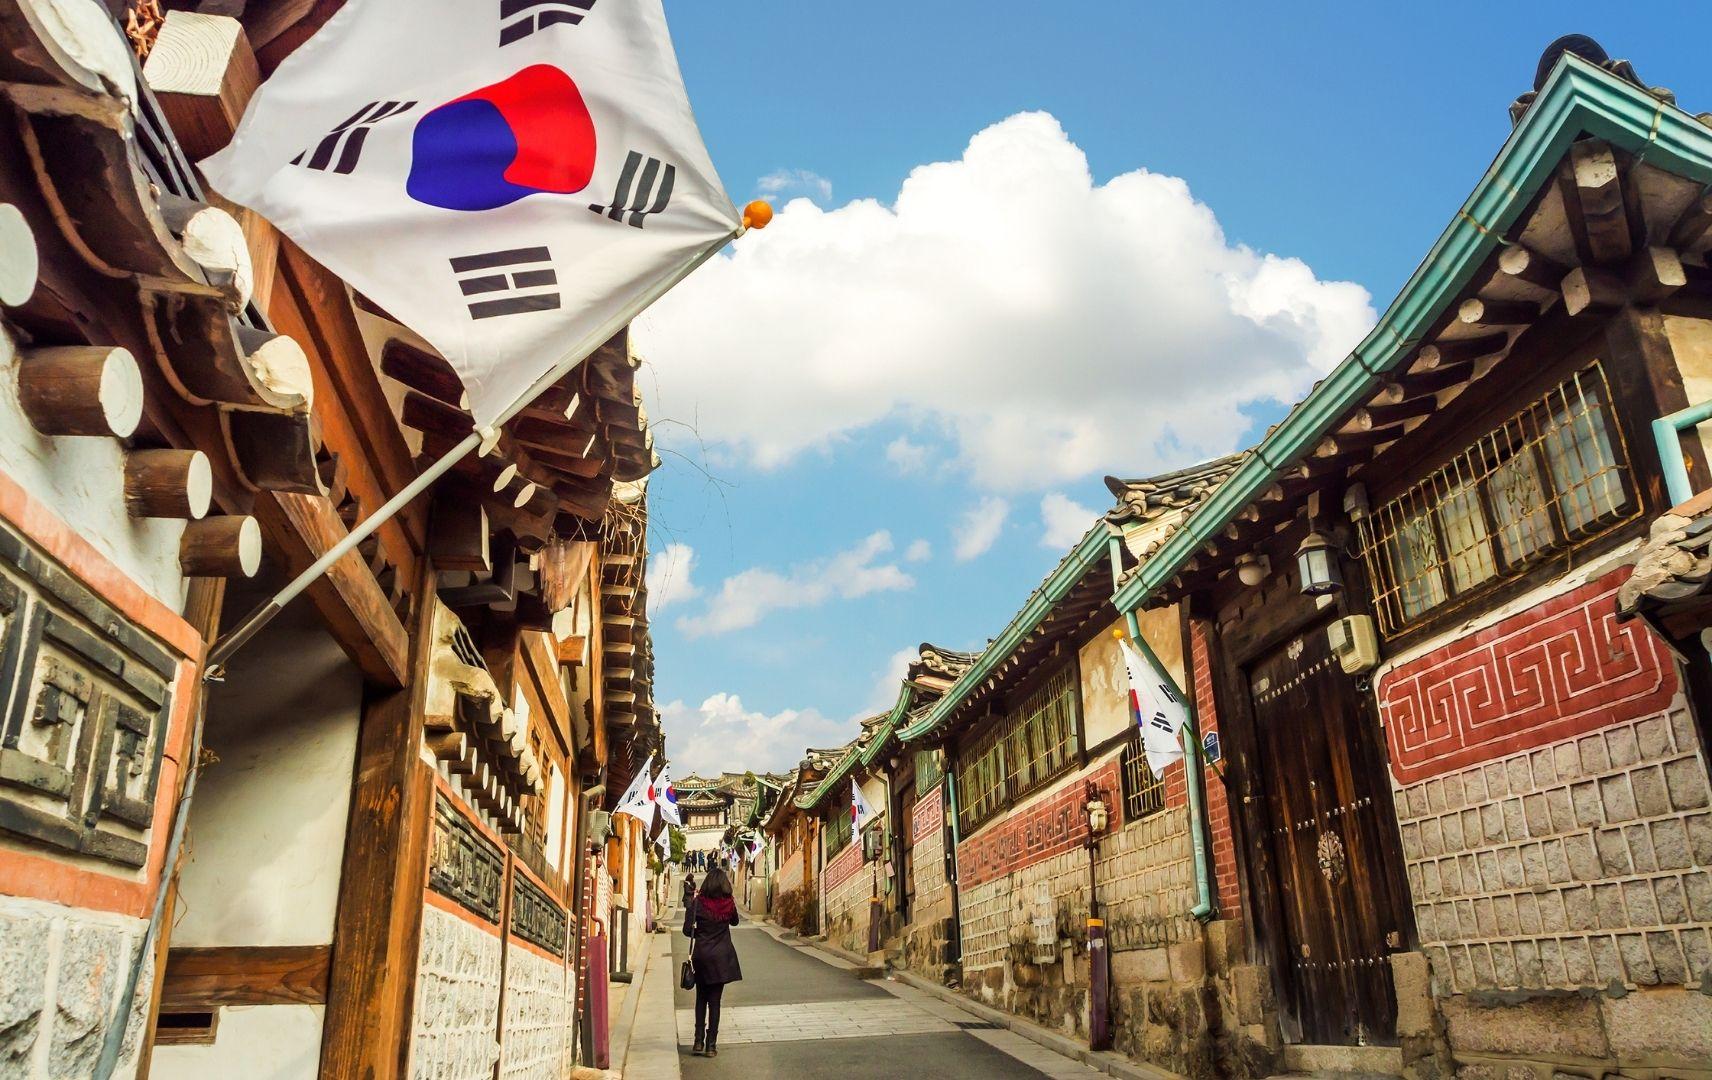 Bukchon Hanok Village and Seoul city skyline